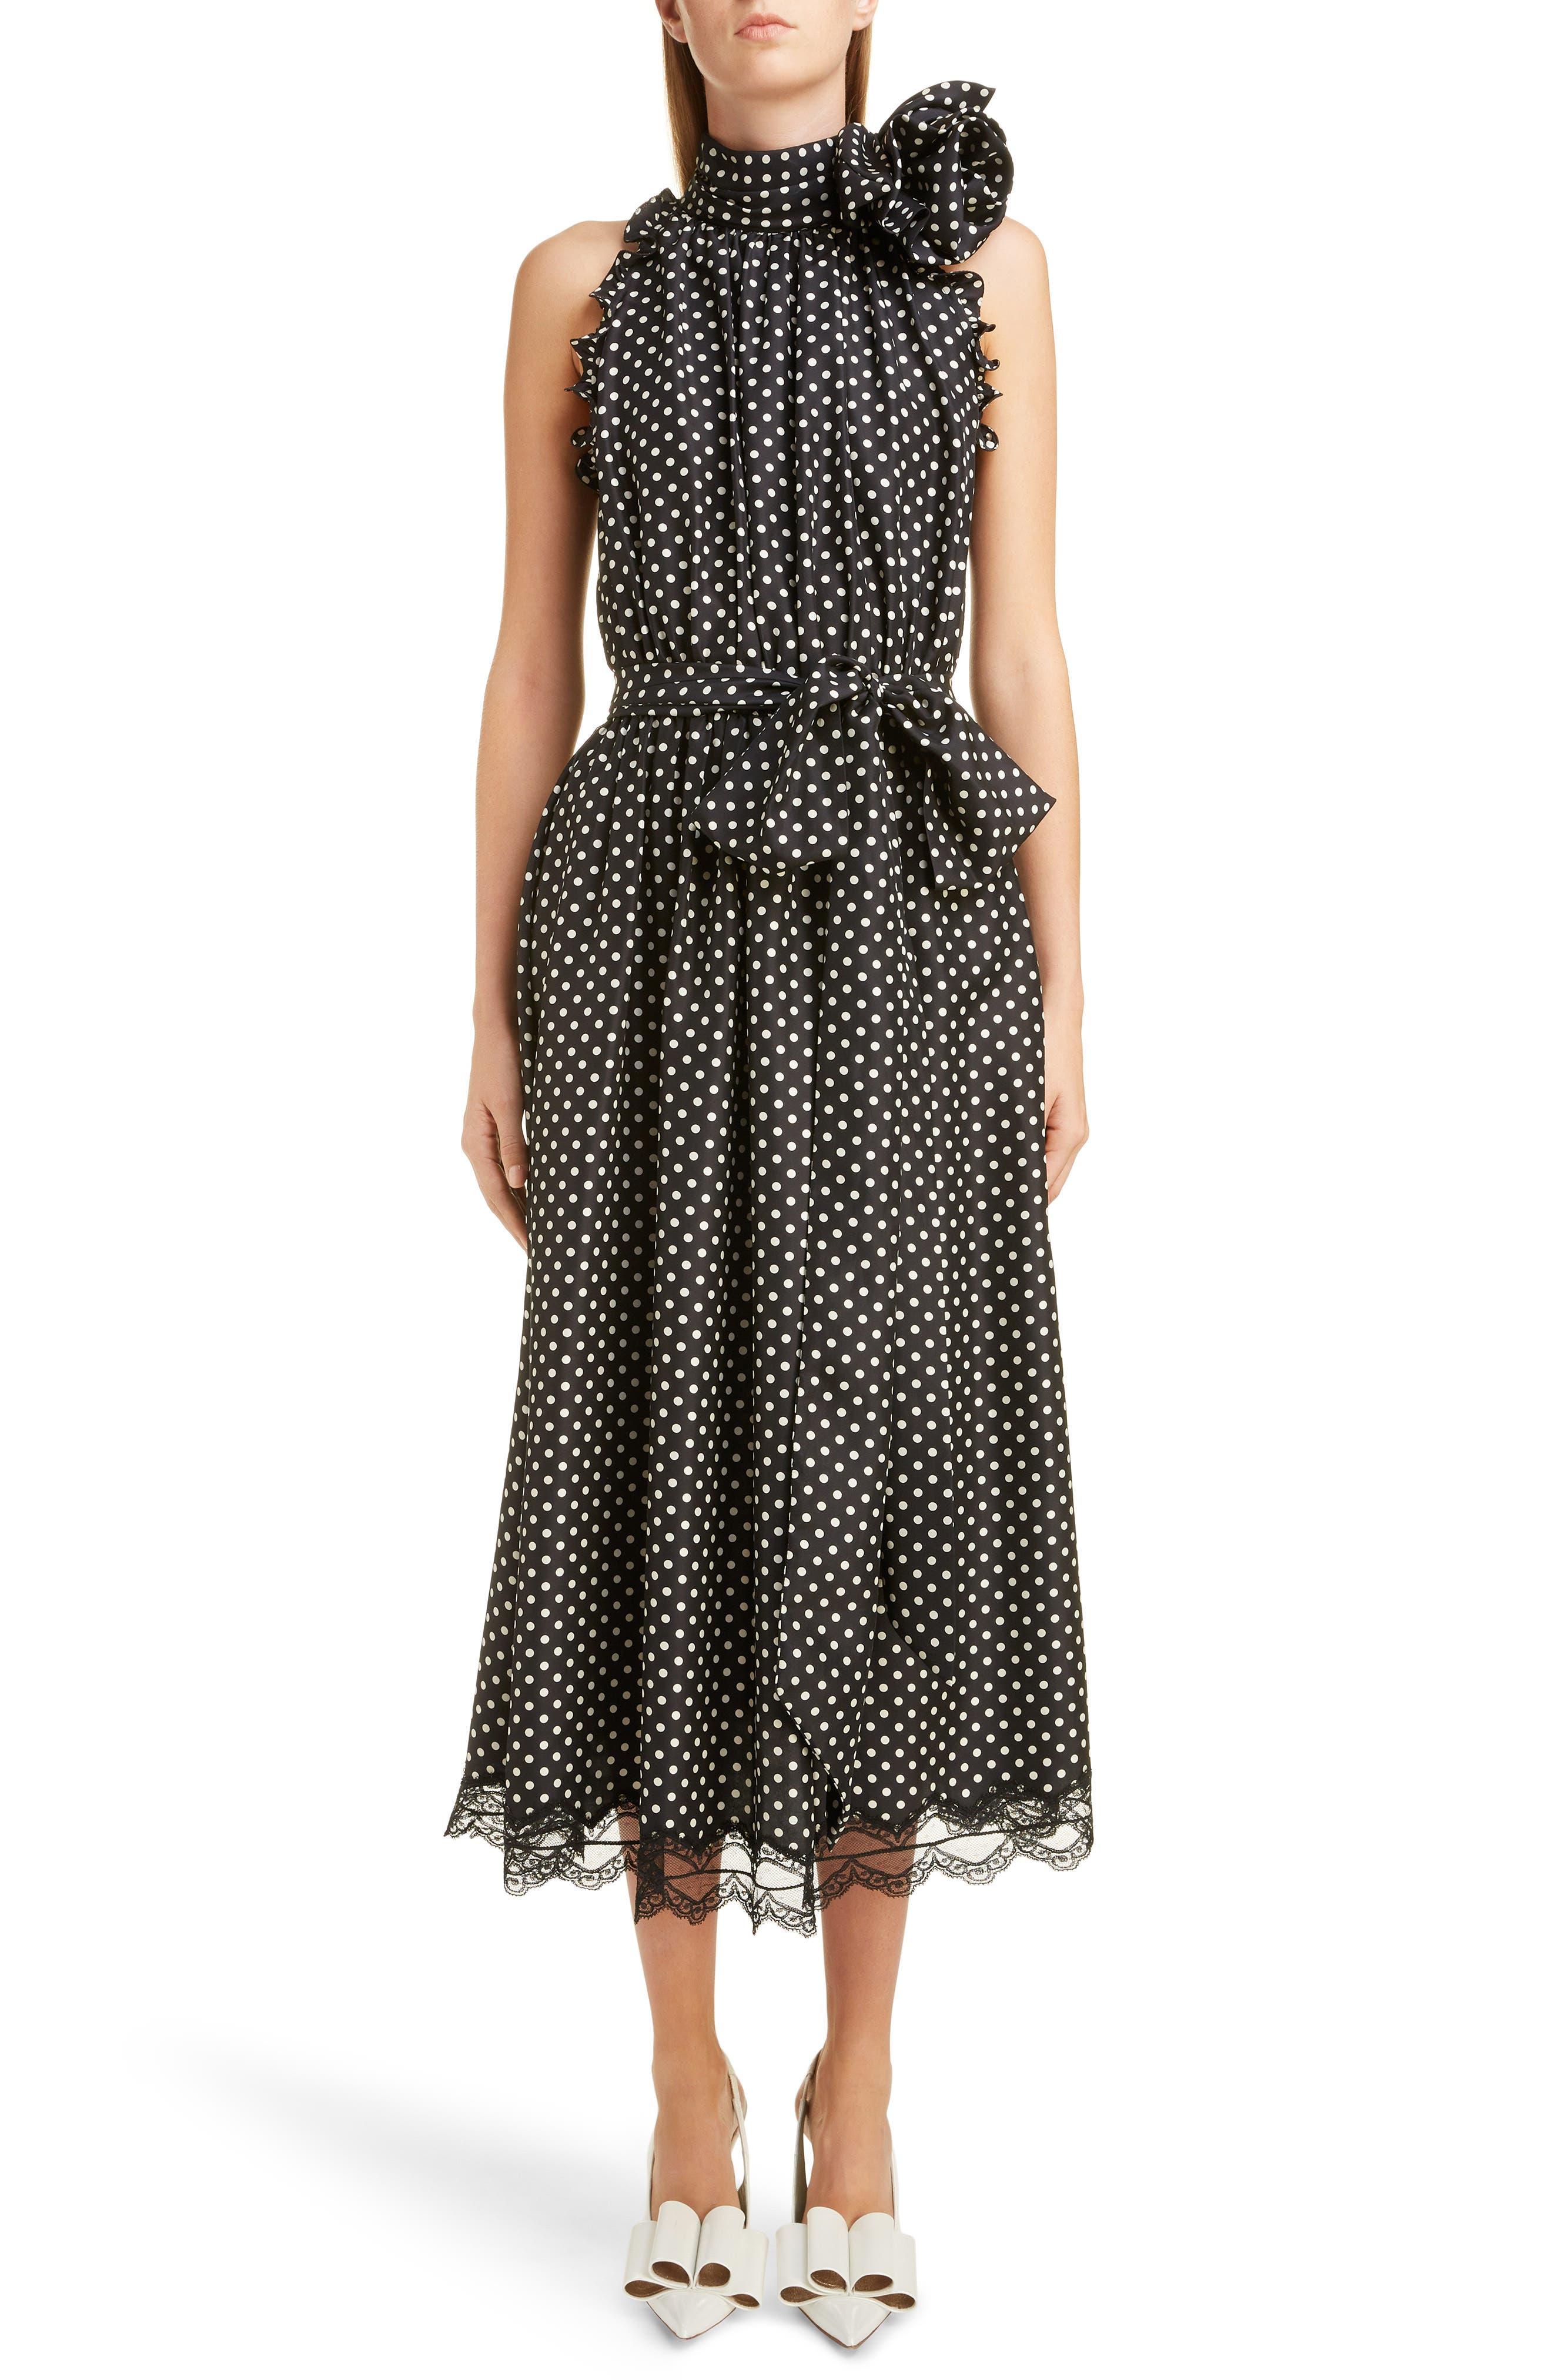 Marc Jacobs Dresses Belted Polka Dot Charmeuse Midi Dress